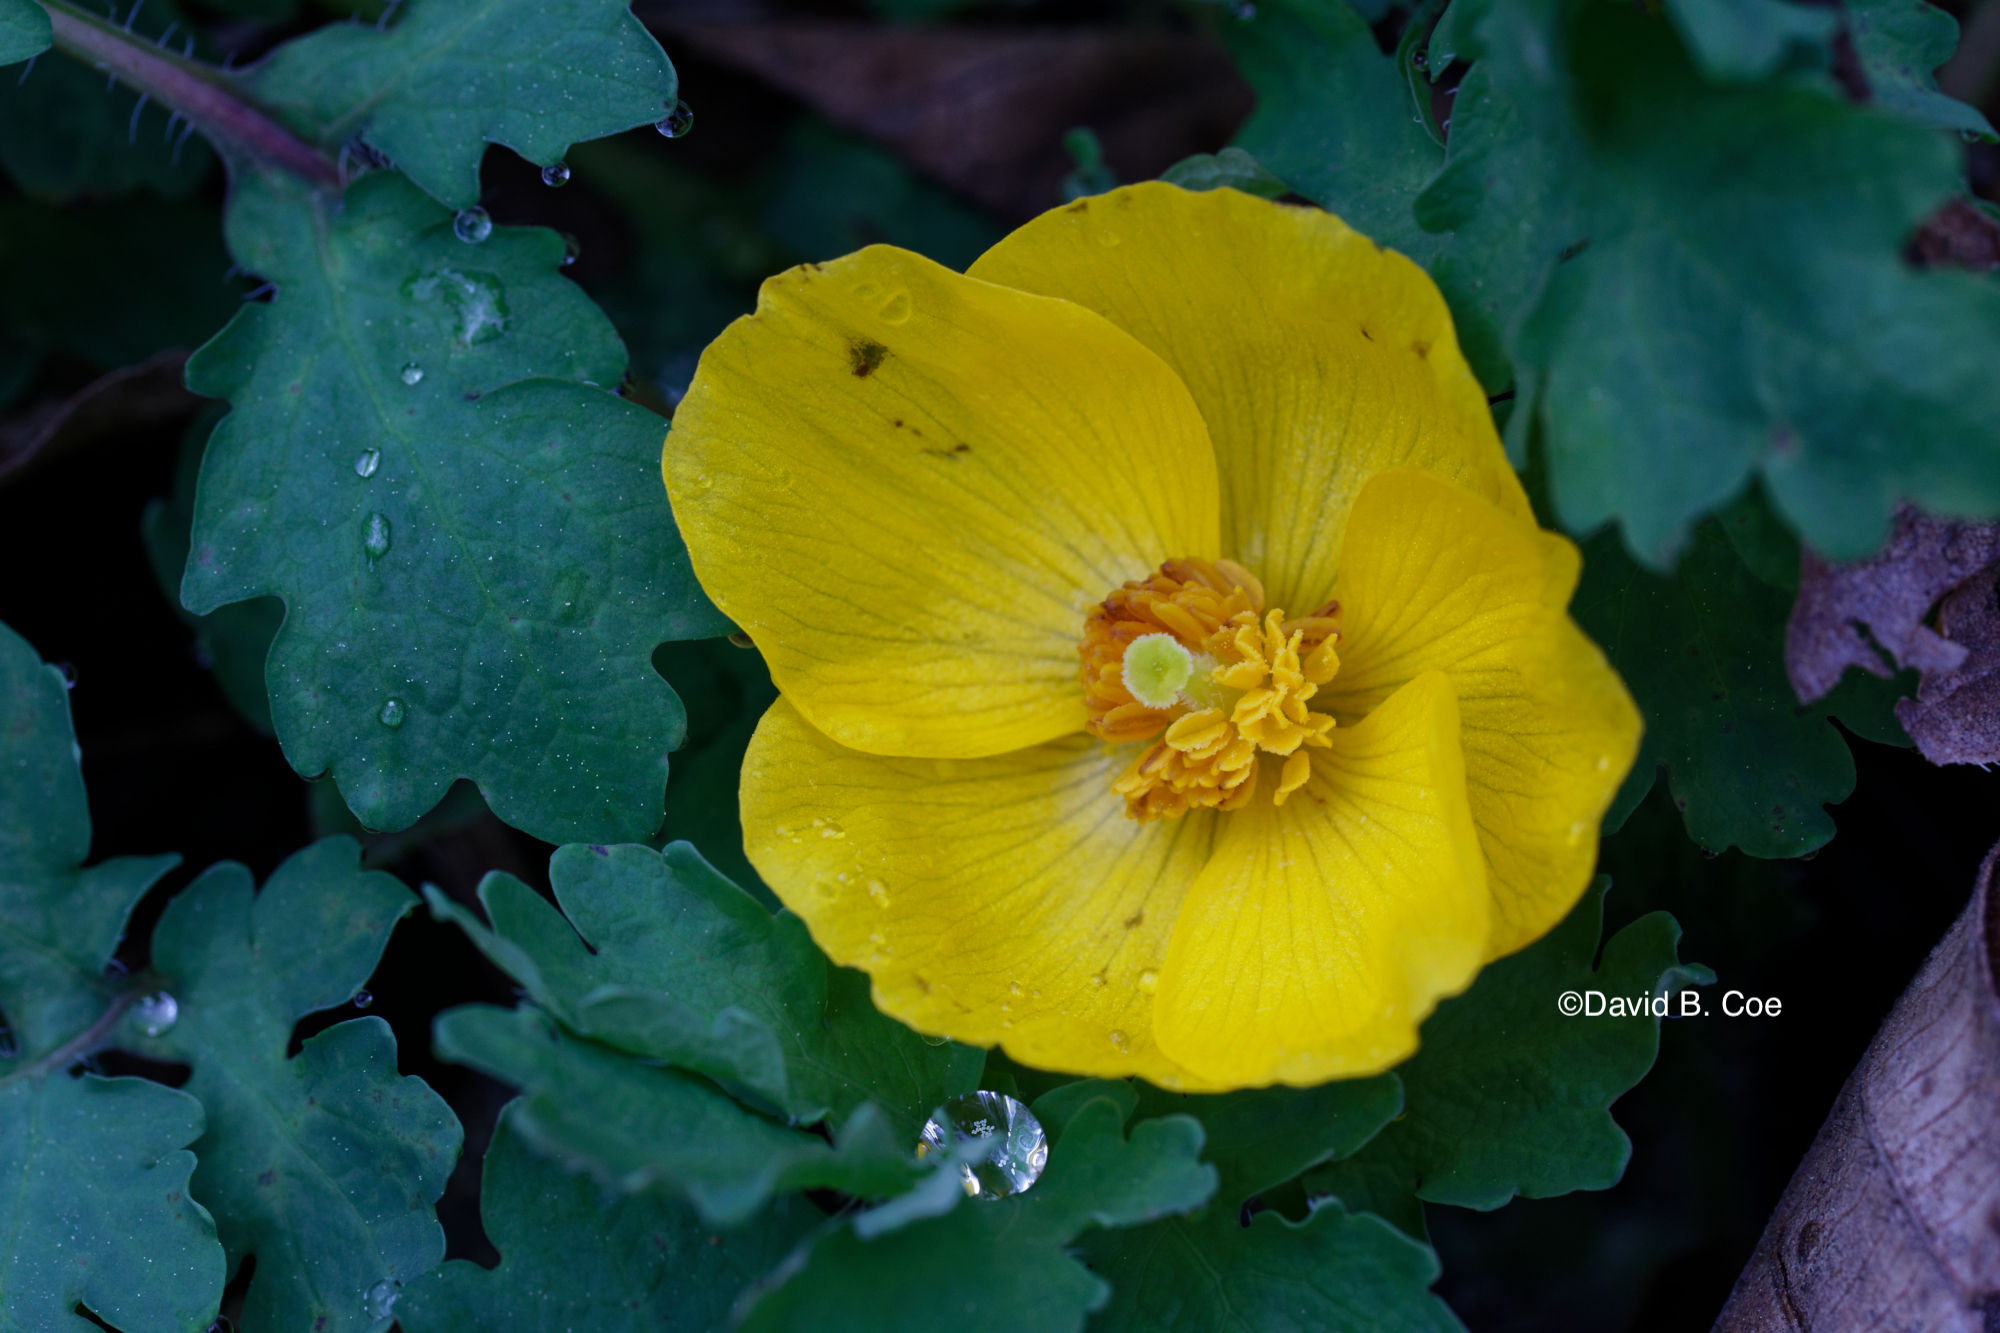 Celandine Poppy After Rain, by David B. Coe